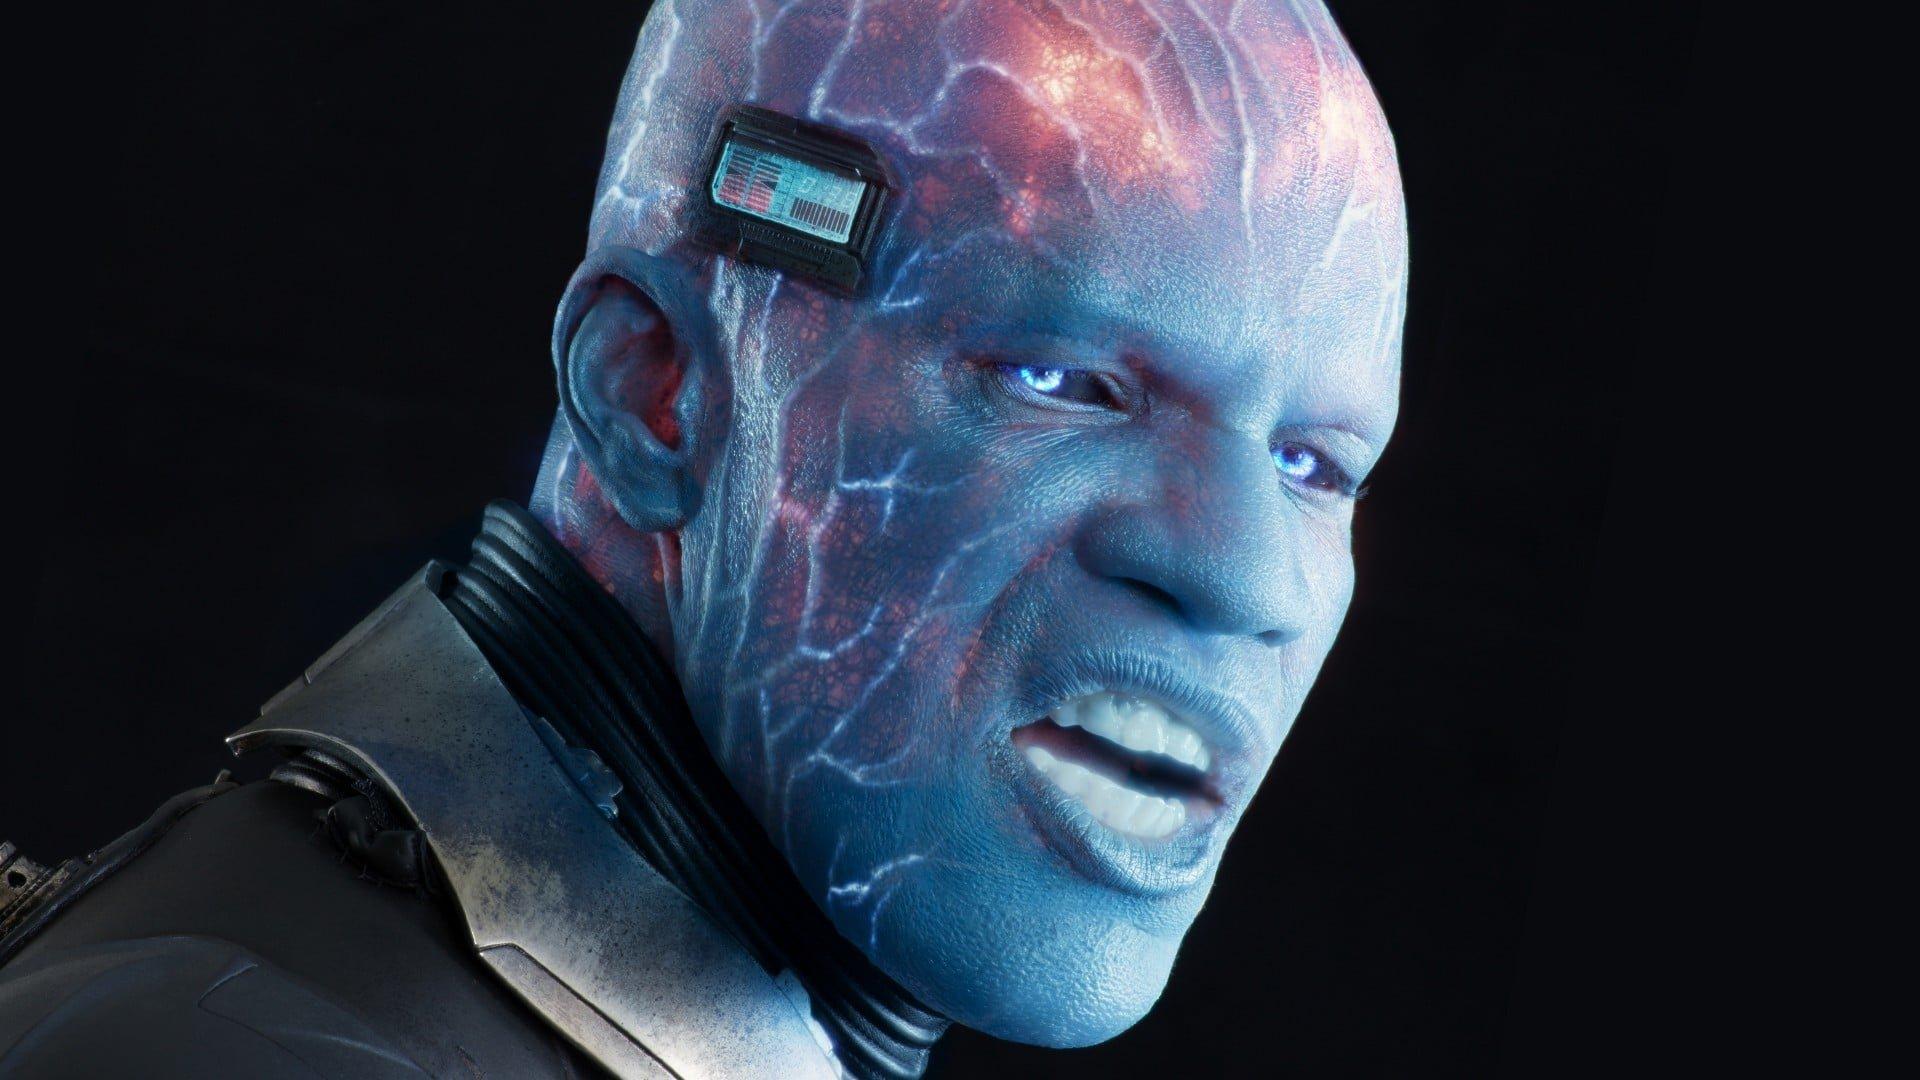 Spider-Man 3 Is Bringing Back Jamie Foxx As Electro